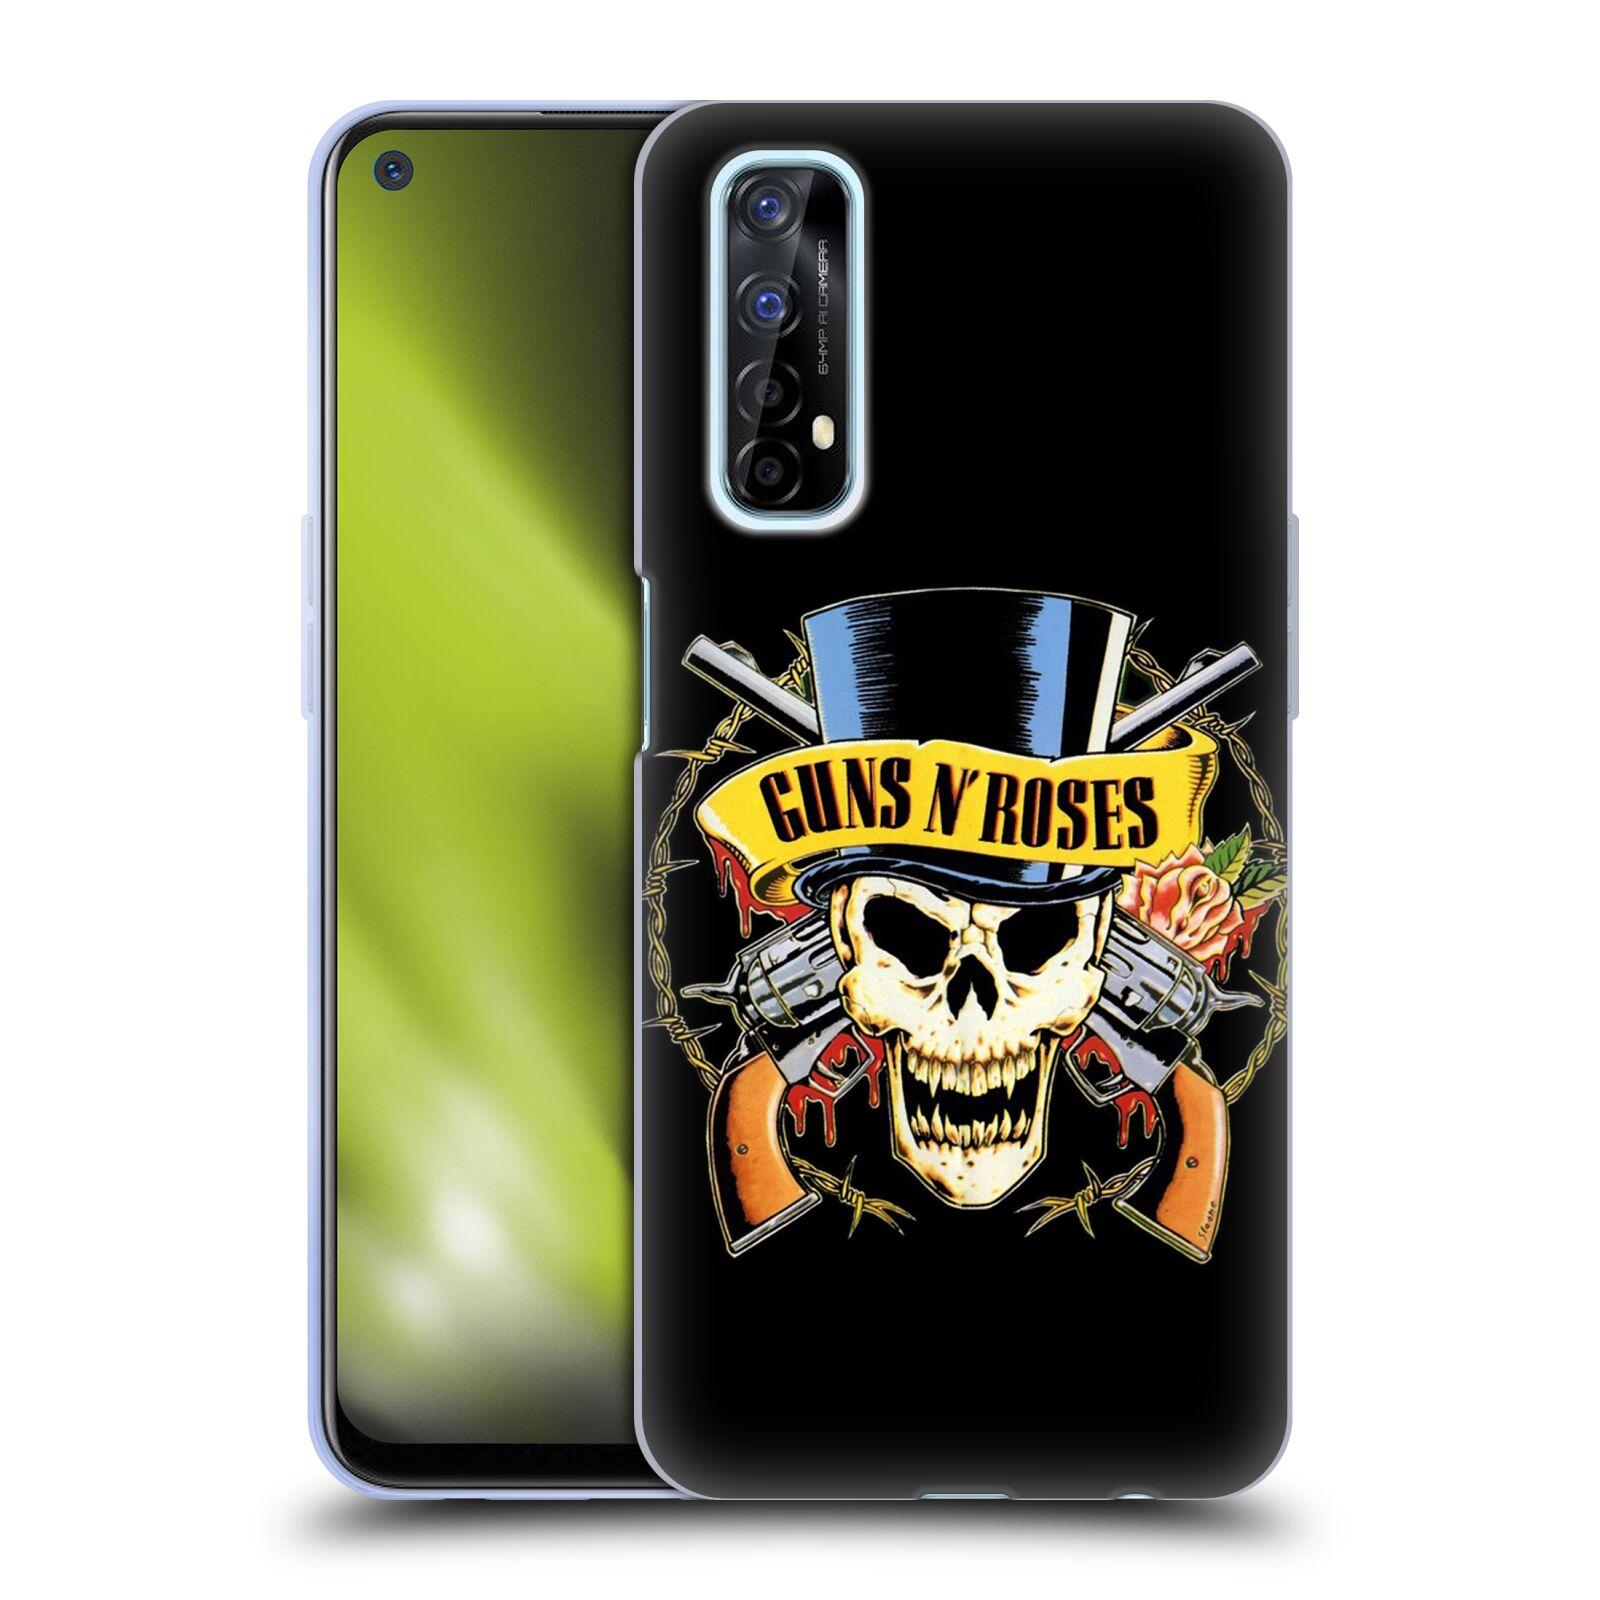 Silikonové pouzdro na mobil Realme 7 - Head Case - Guns N' Roses - Lebka